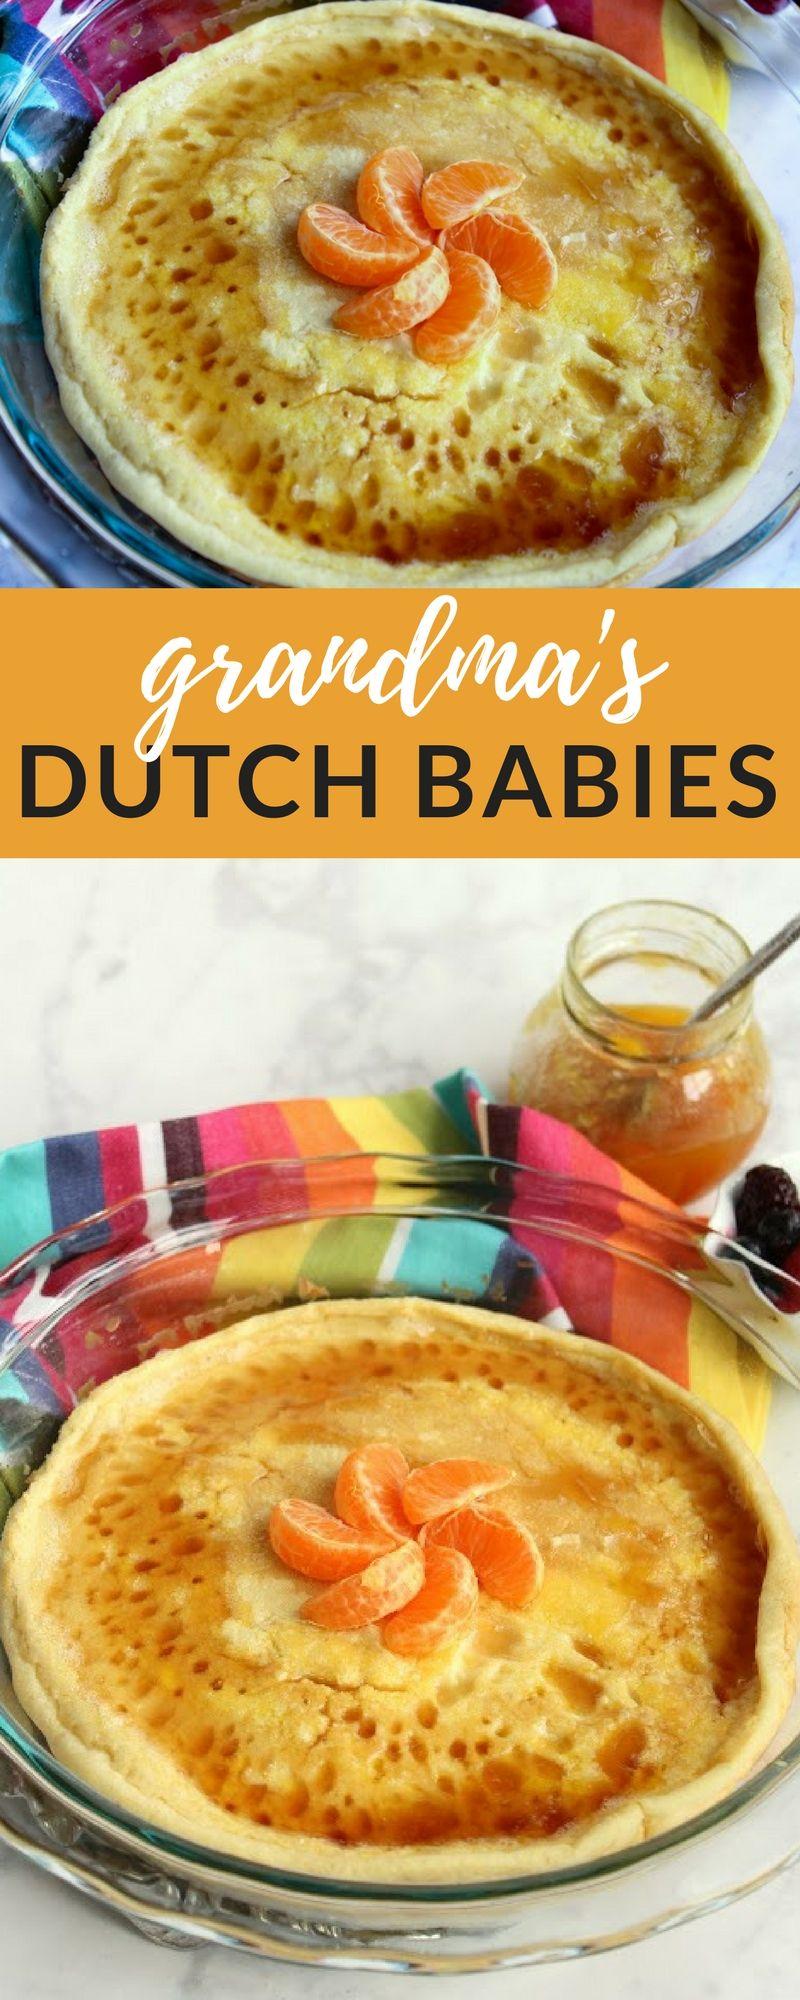 Grandma's Dutch Babies | Recipe in 2020 | Delicious ...